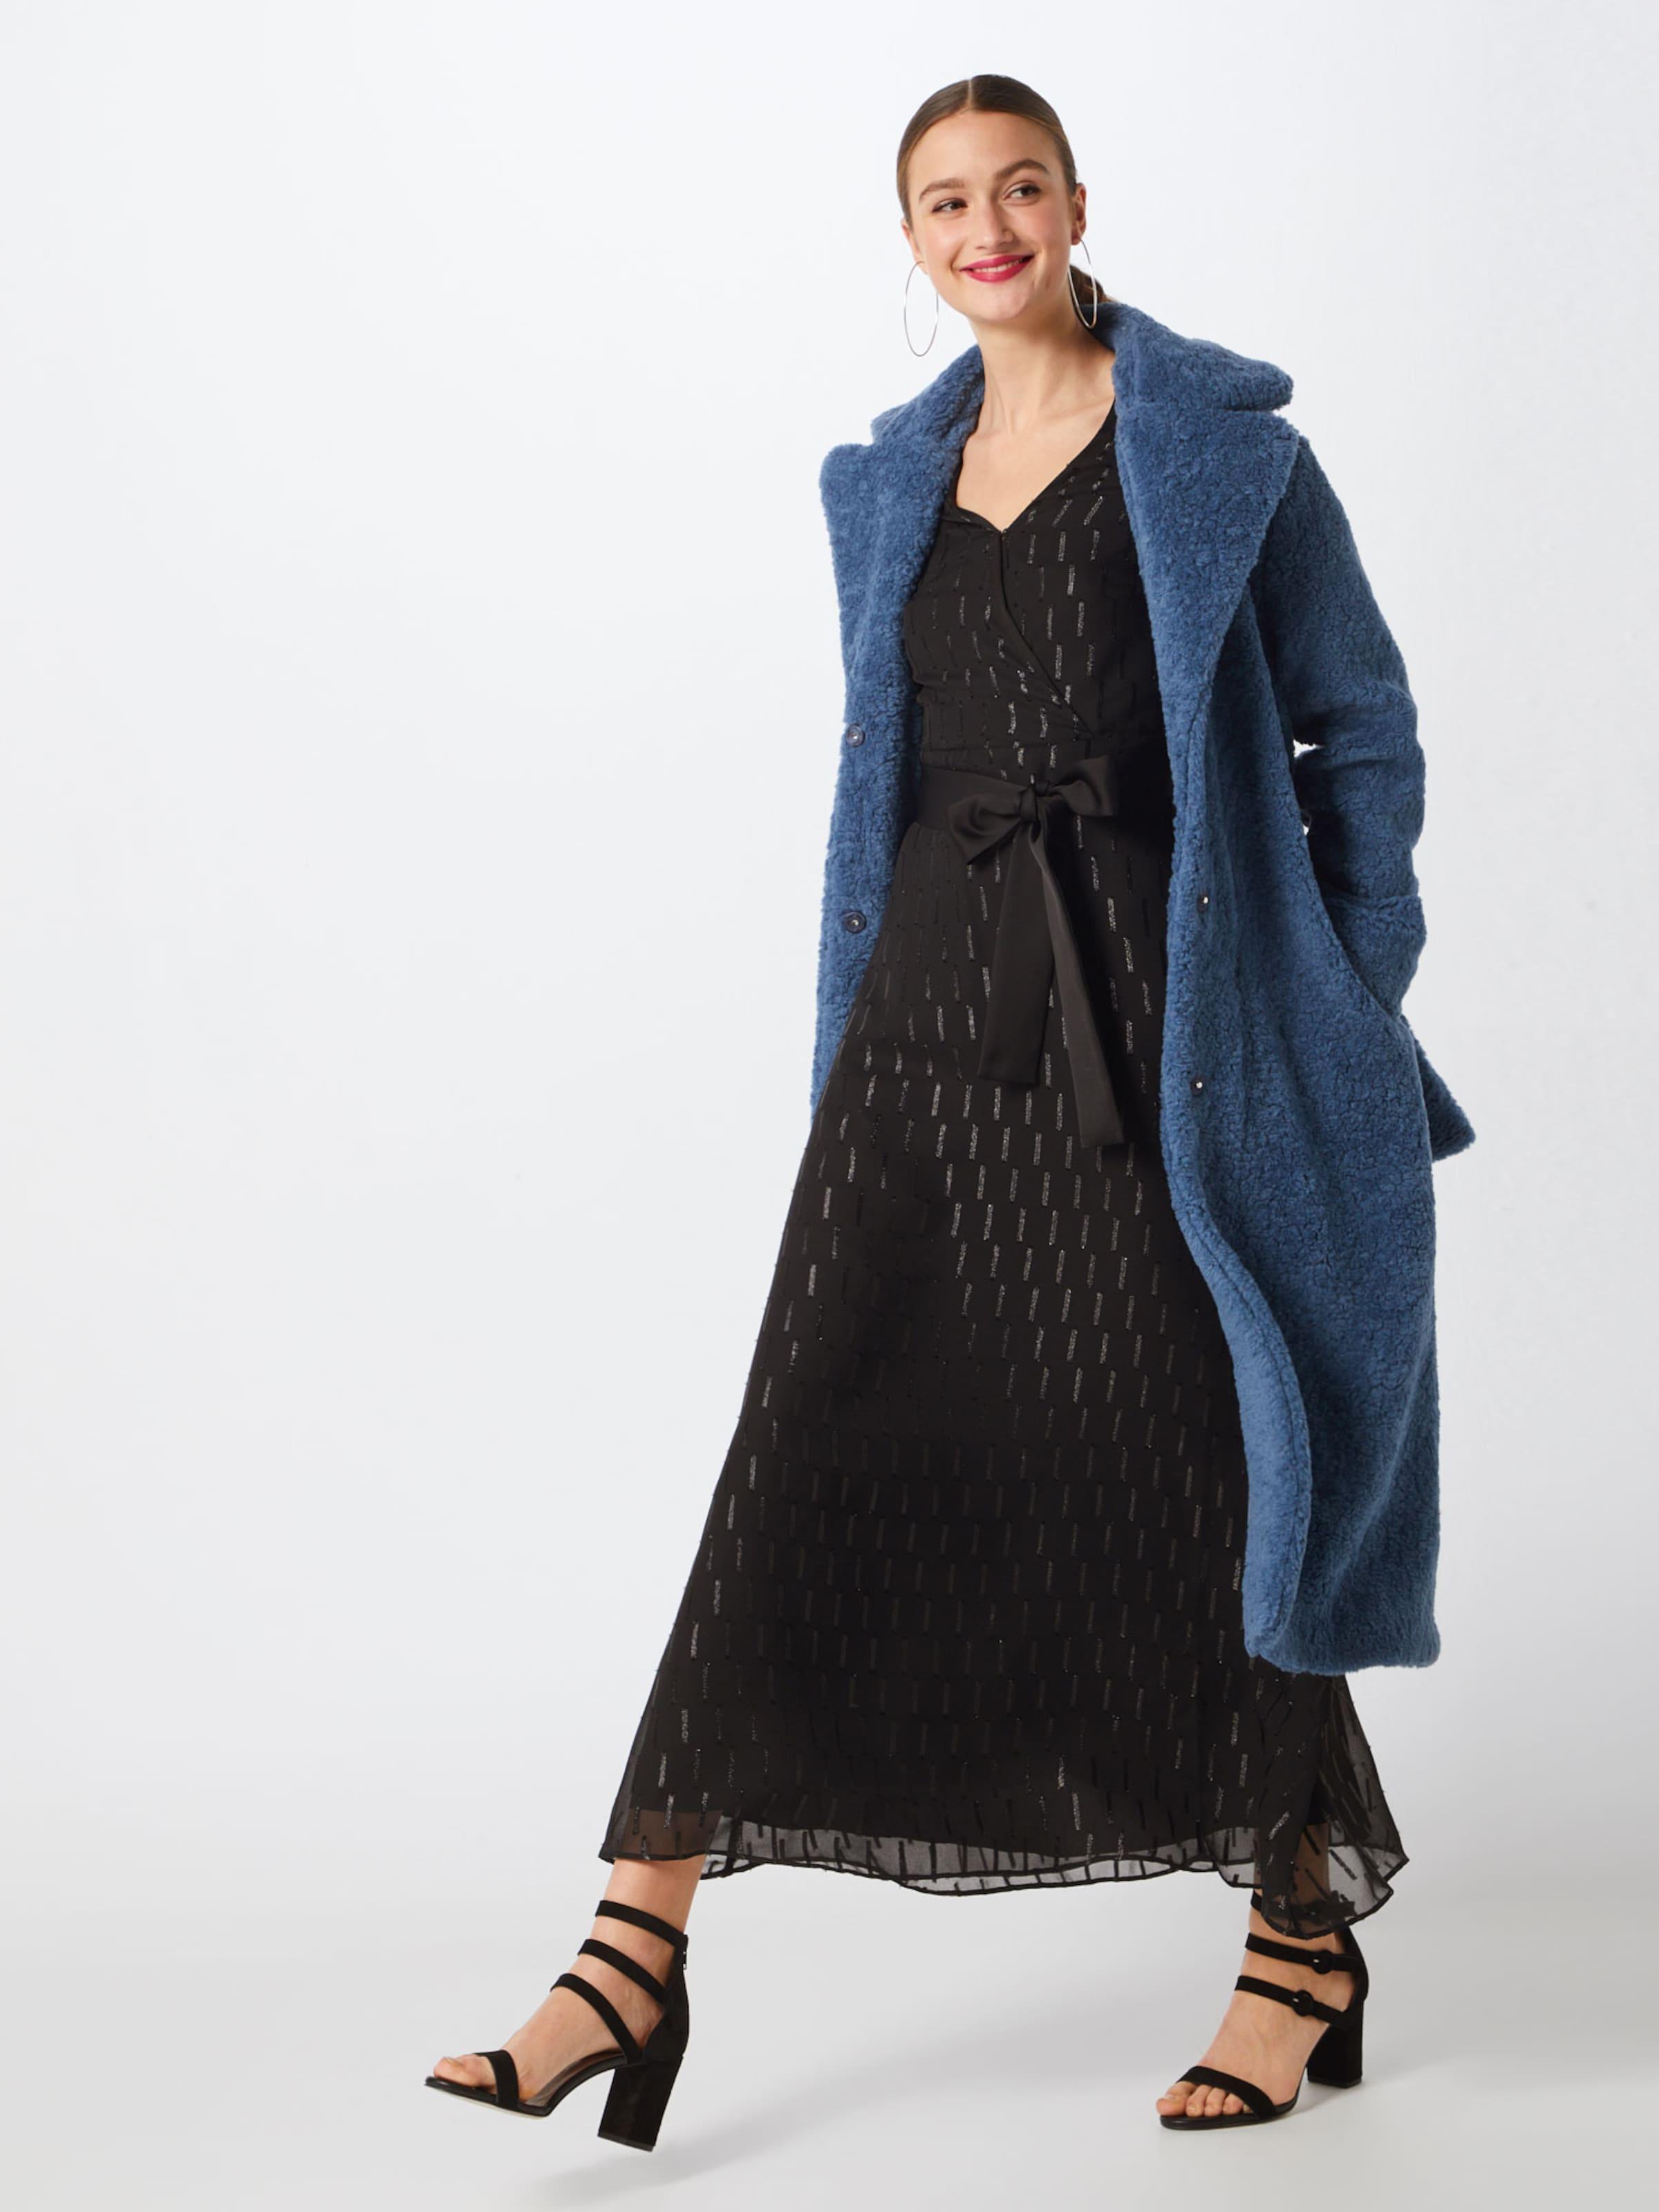 Robe Noir Faux 'i Maxi Shimmer Banana Wrap Dress' En Republic qUMVSpz